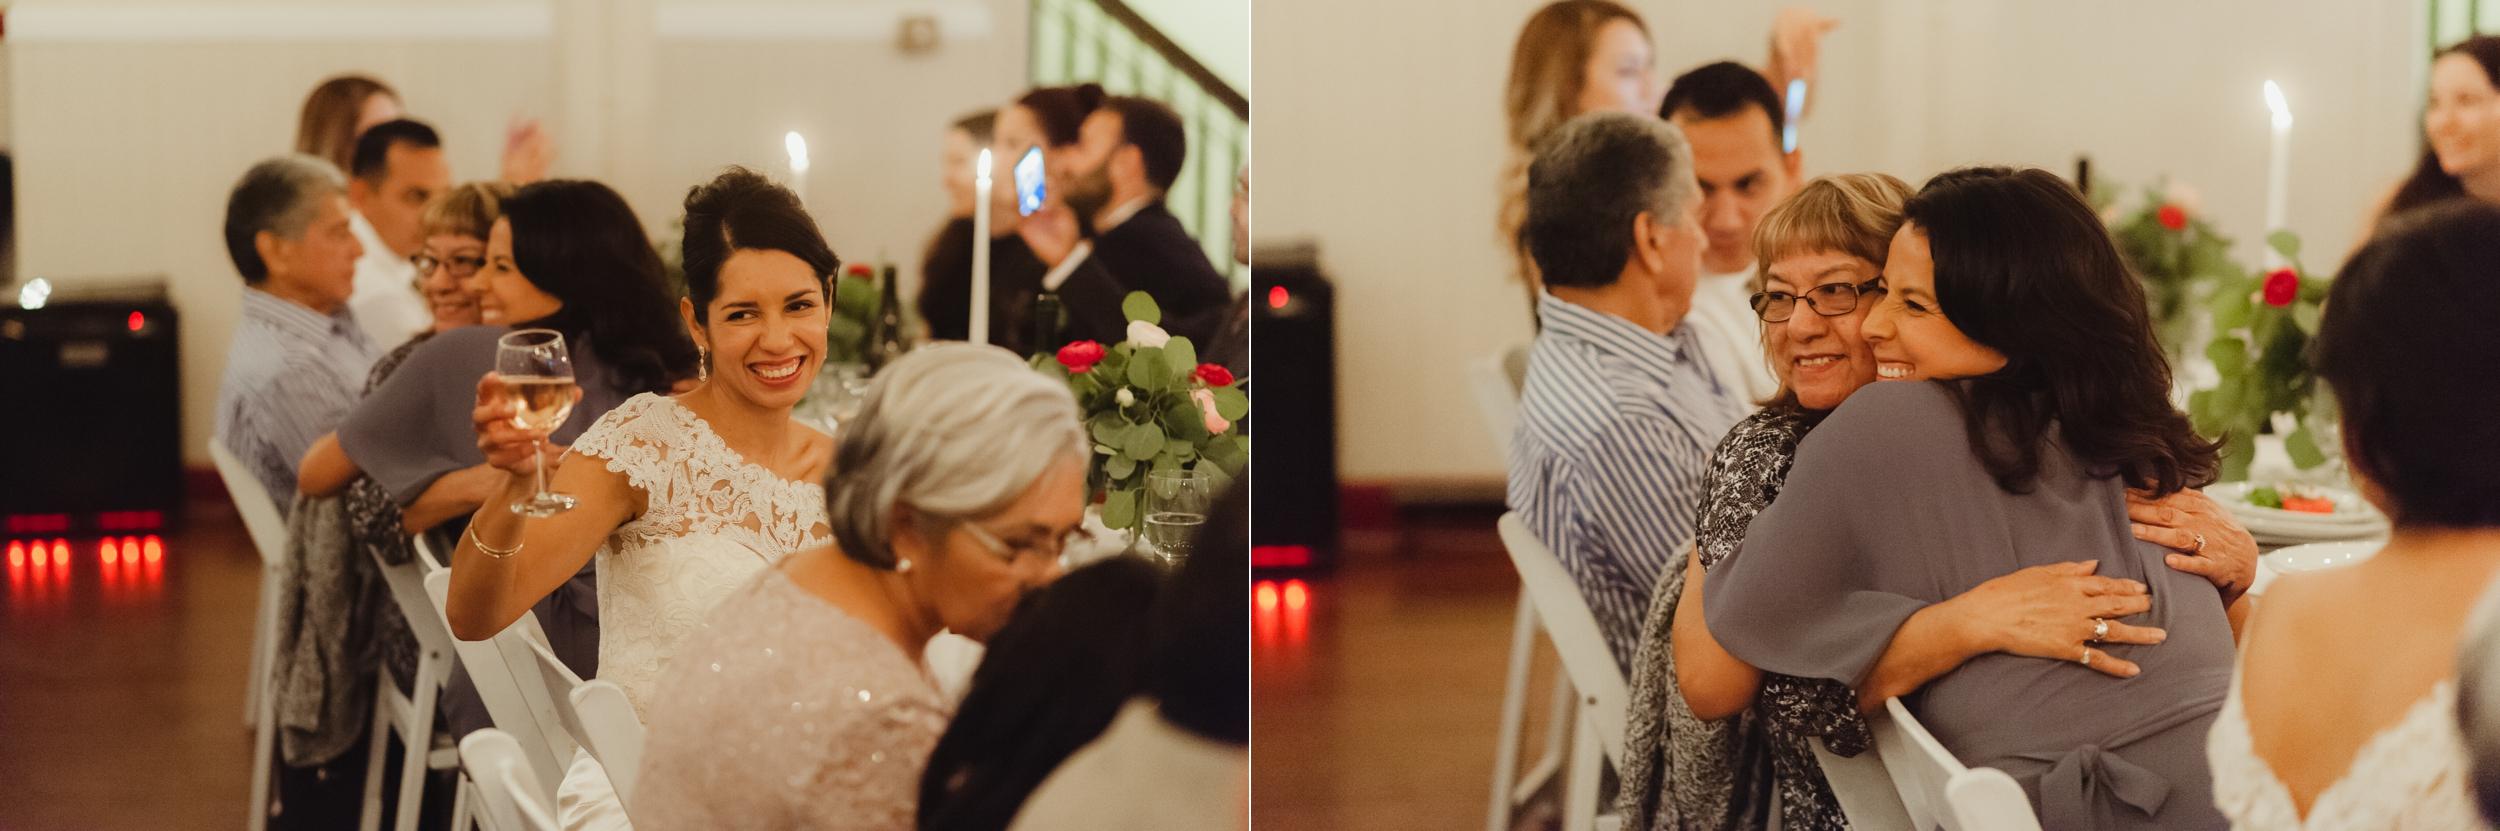 73san-francisco-stern-grove-wedding-photographer-vivianchen-467_WEB.jpg